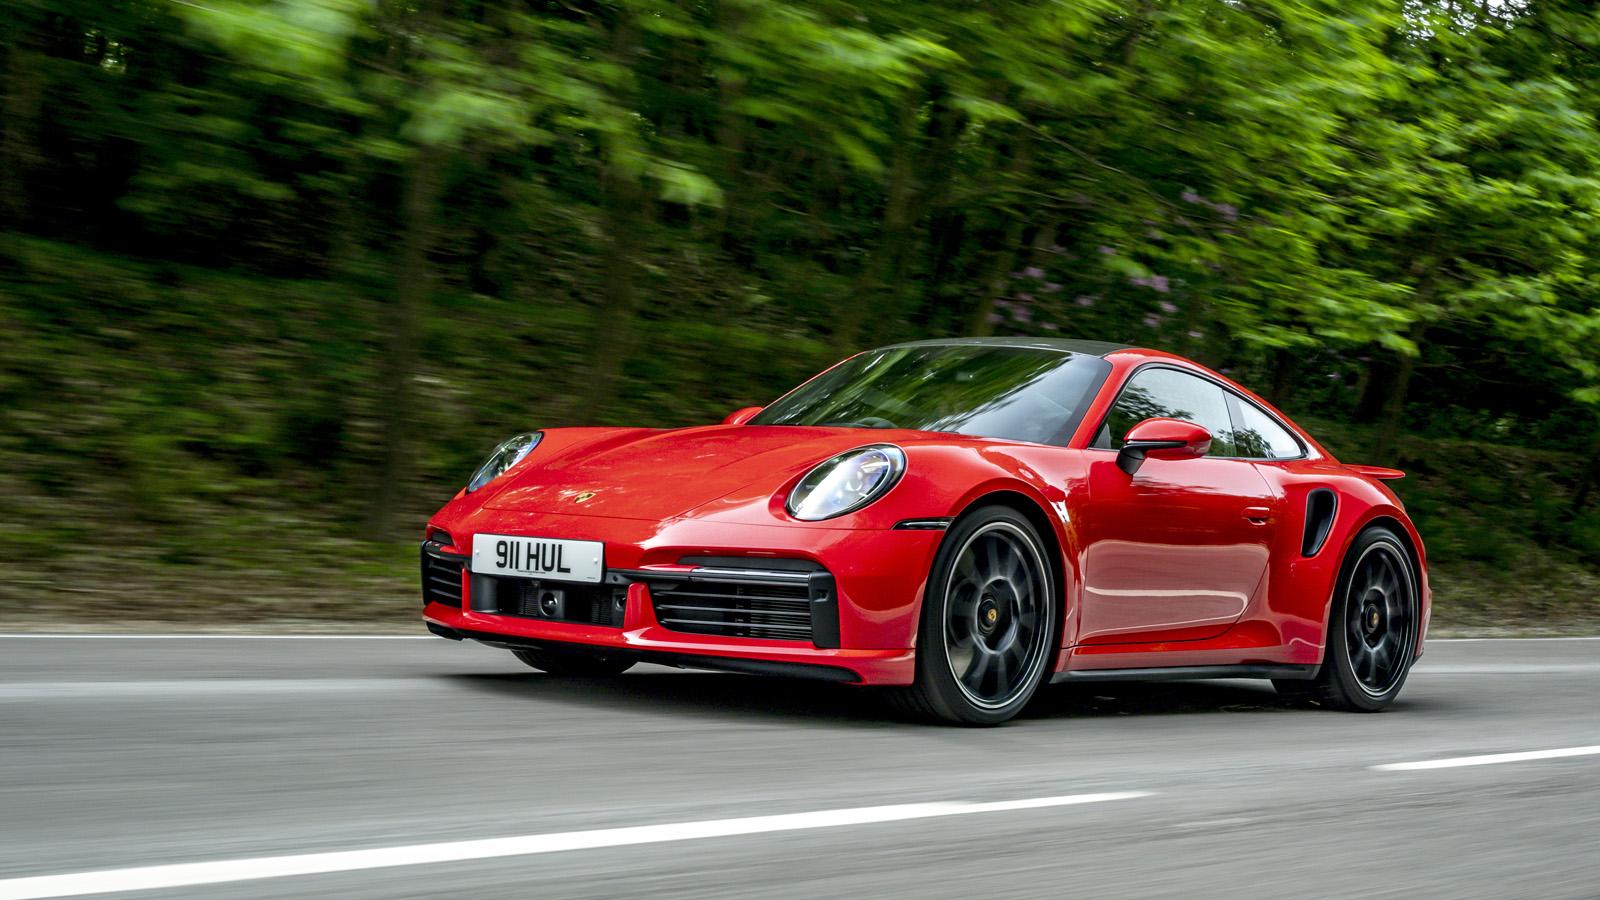 2020 Porsche 911 Turbo S Photo Gallery Autoblog